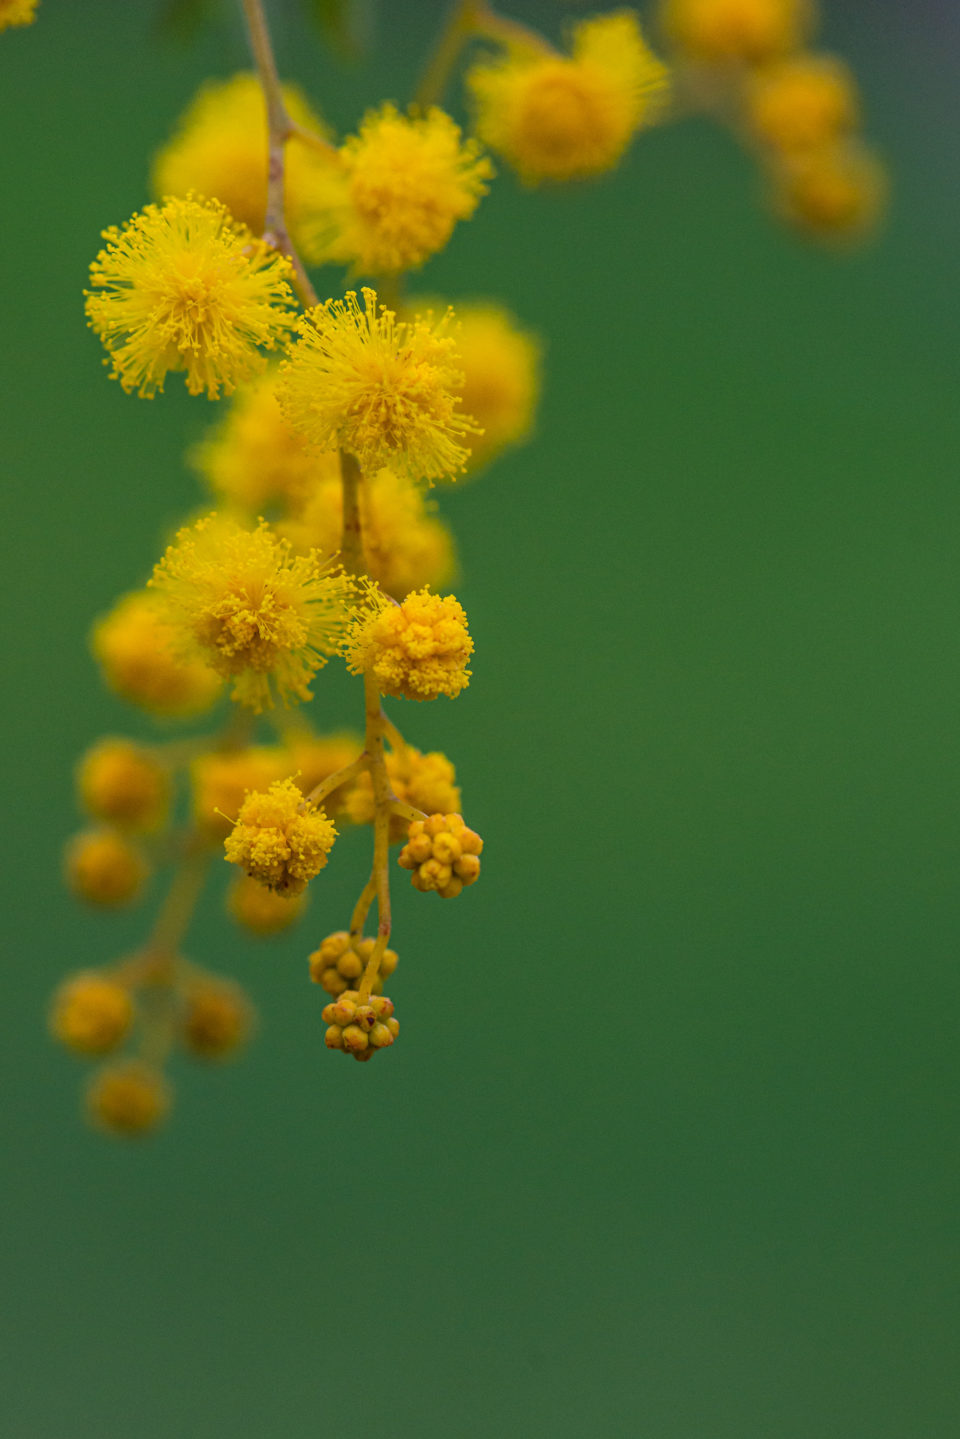 Lucille_Galleli-Floral _2020_8327